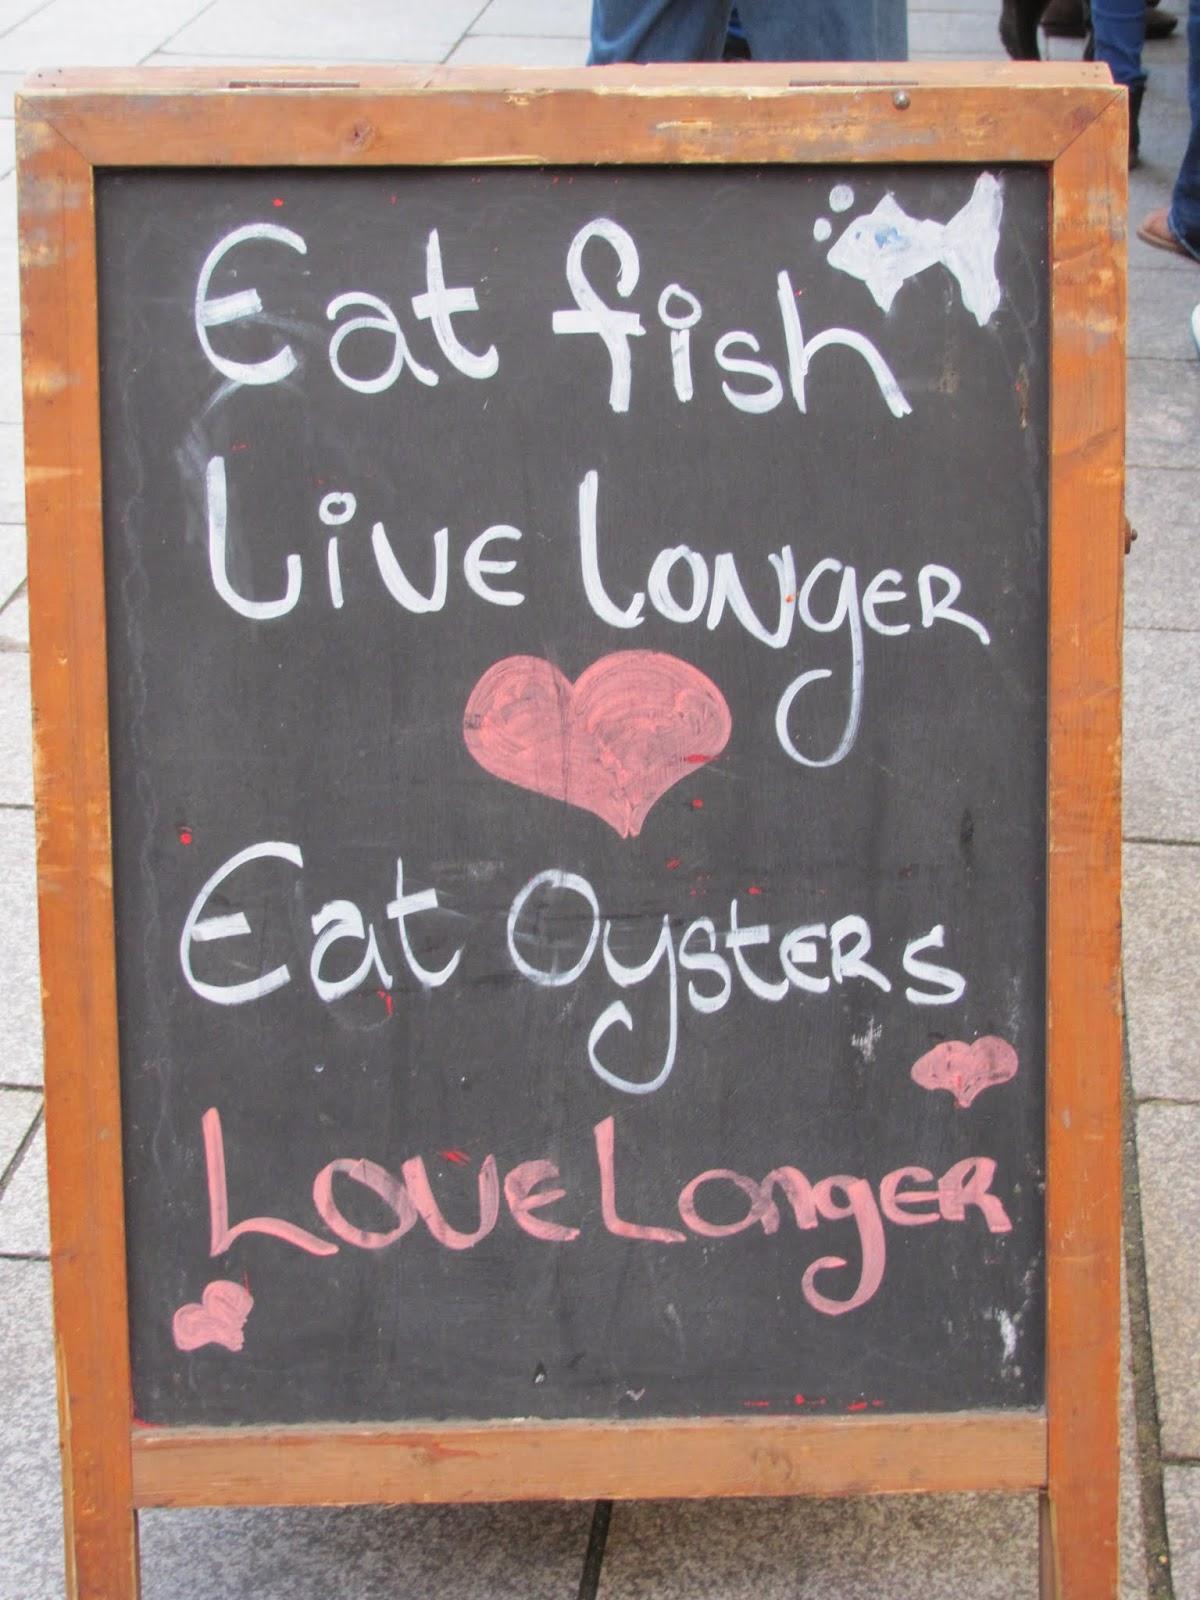 Food Market Oyster Bar Dublin, Ireland